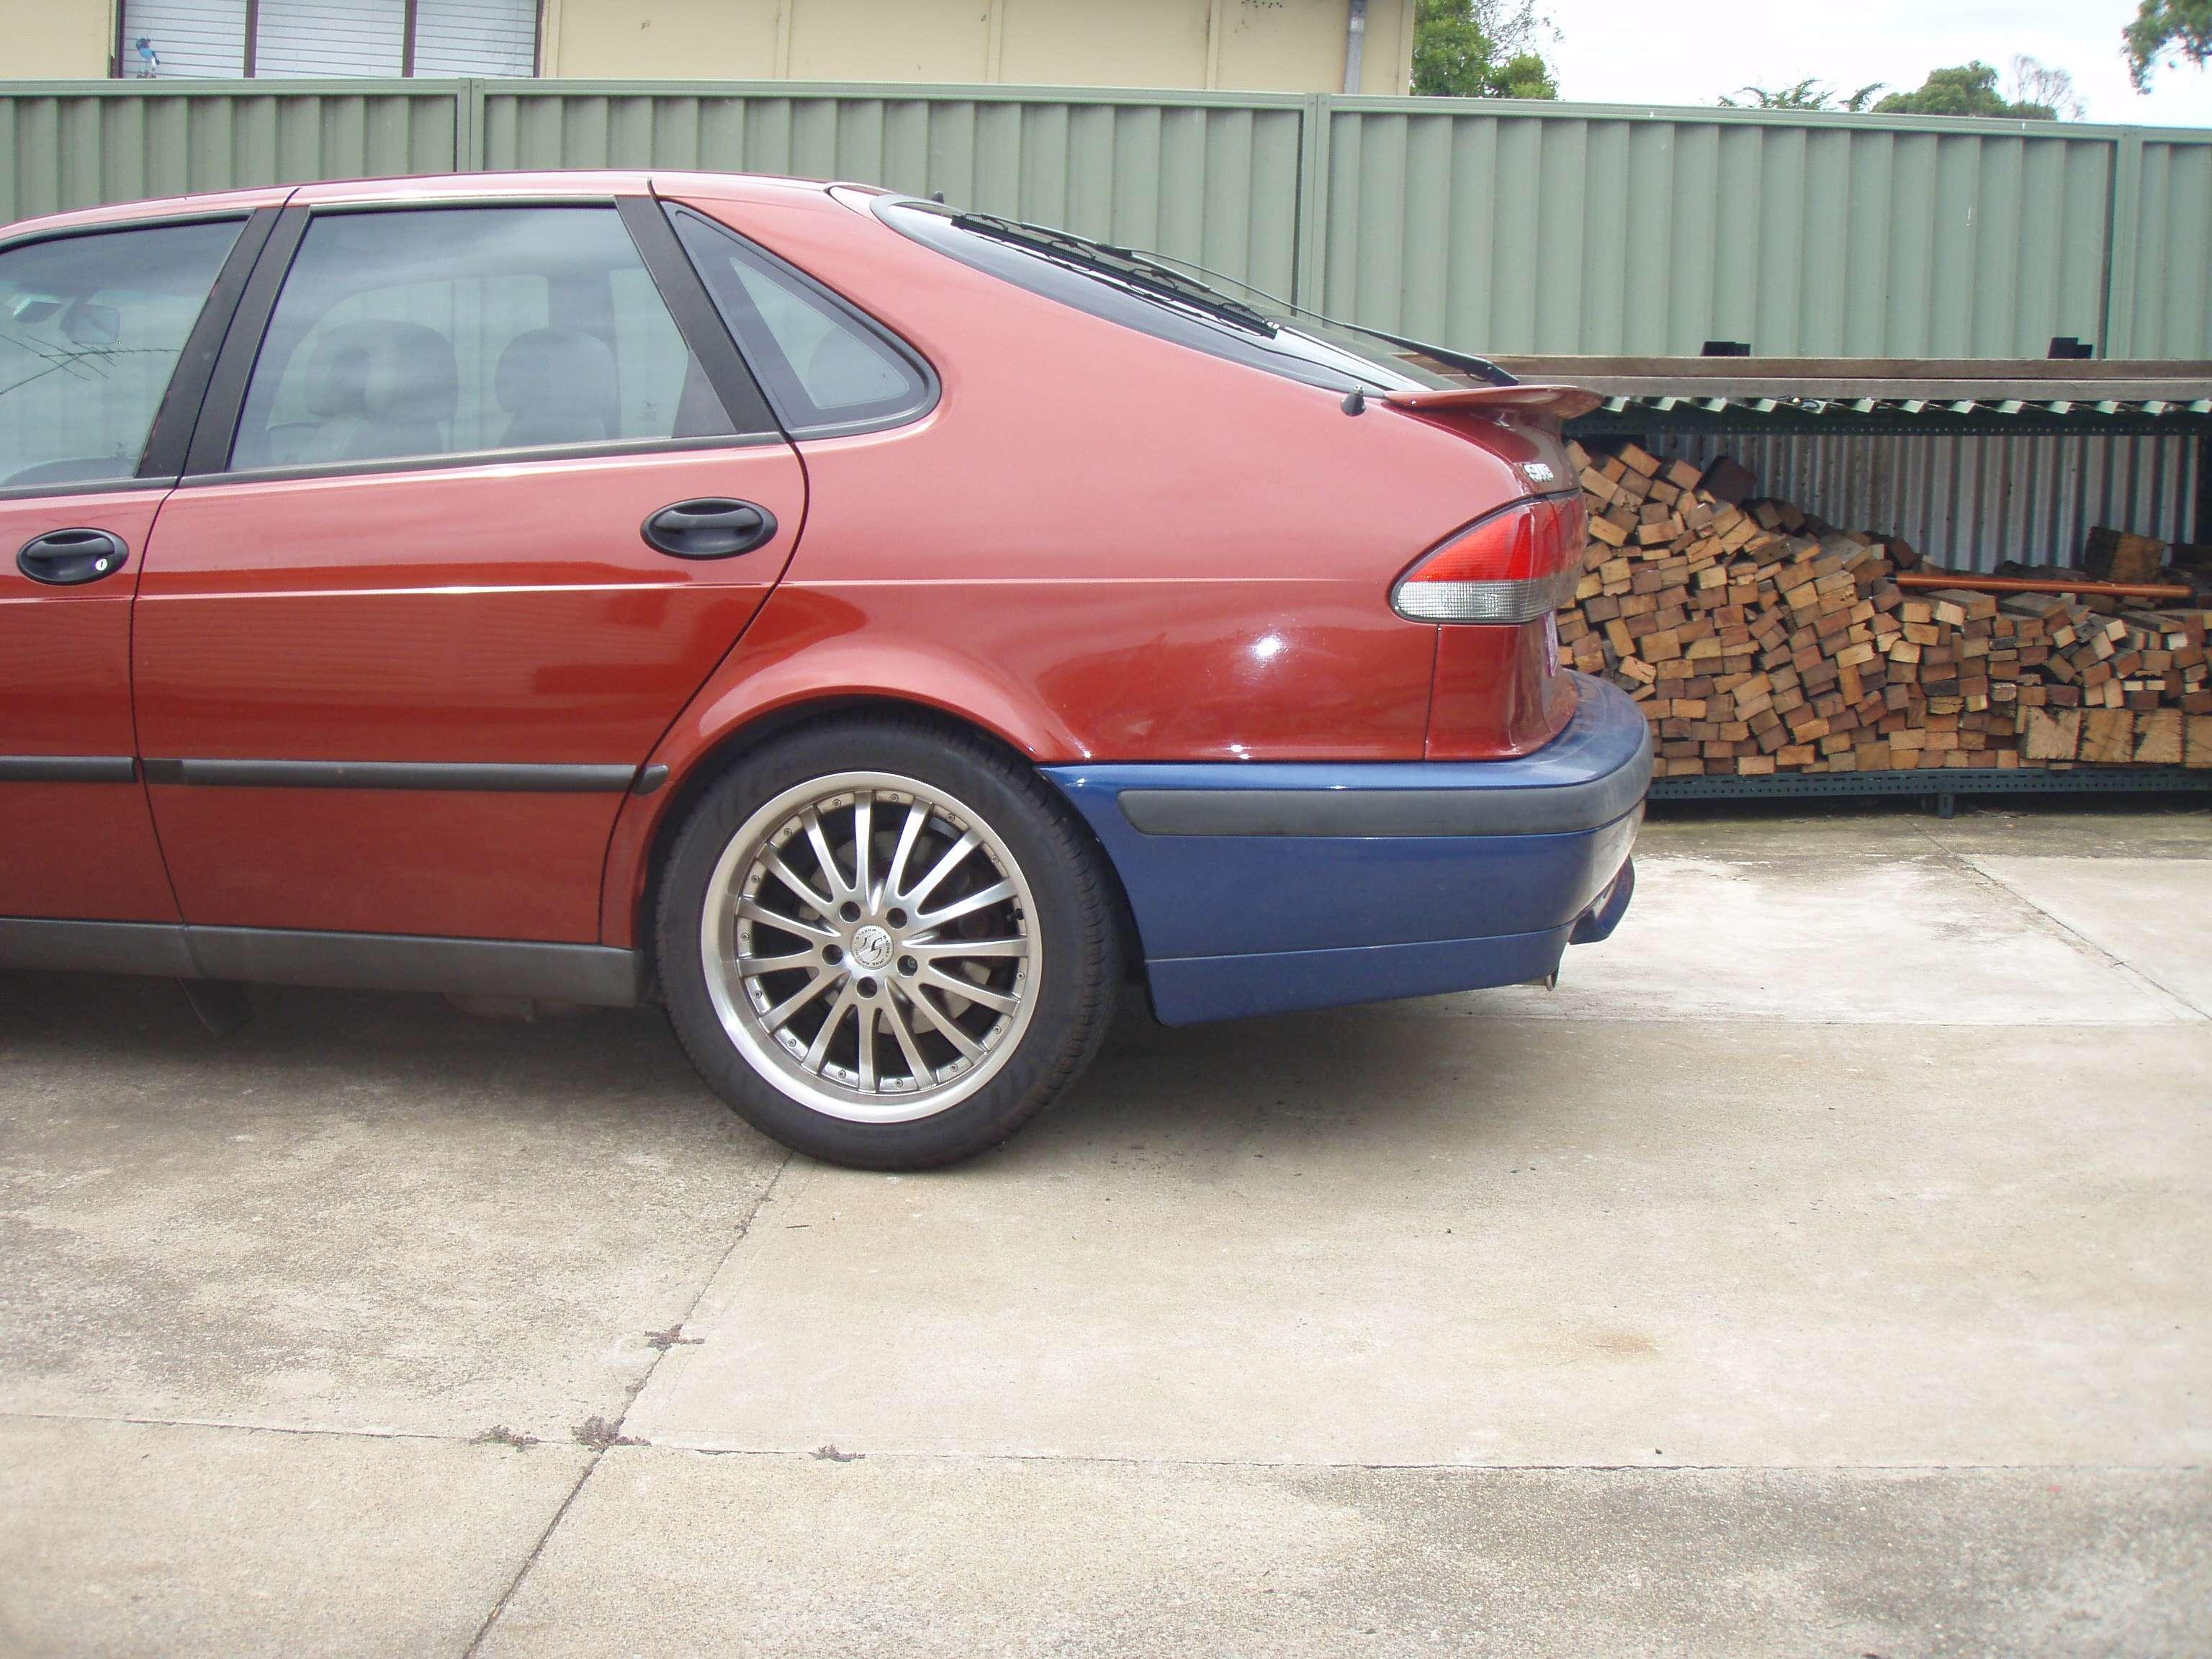 Rear bumper swap - The Saab Link Forums